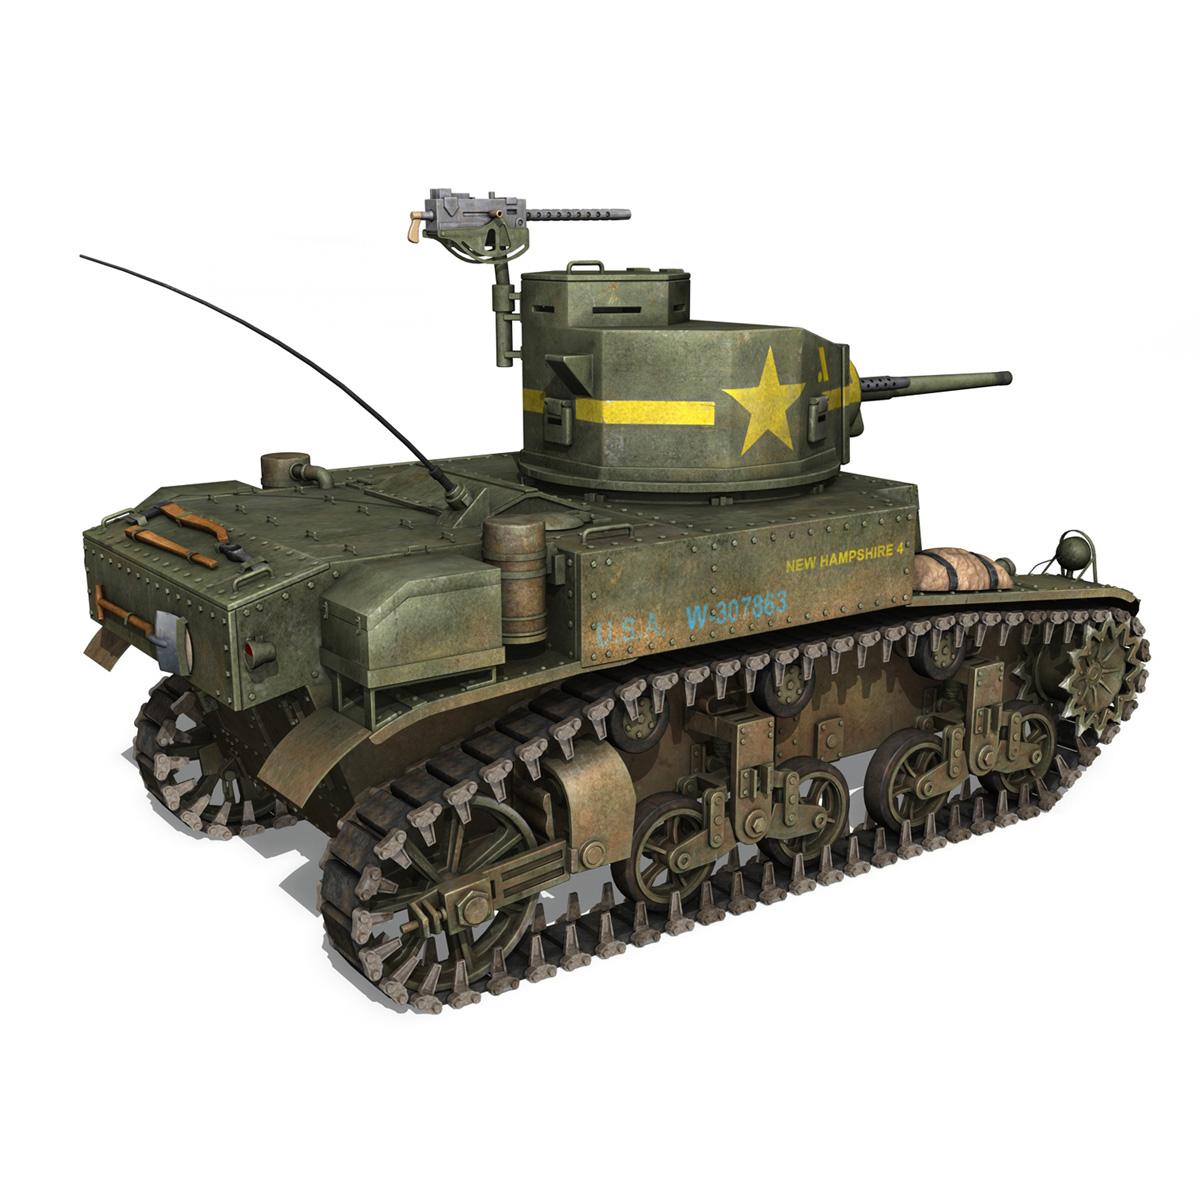 m3 light tank stuart – new hampshire 4 3d model 3ds c4d fbx lwo lw lws obj 266378